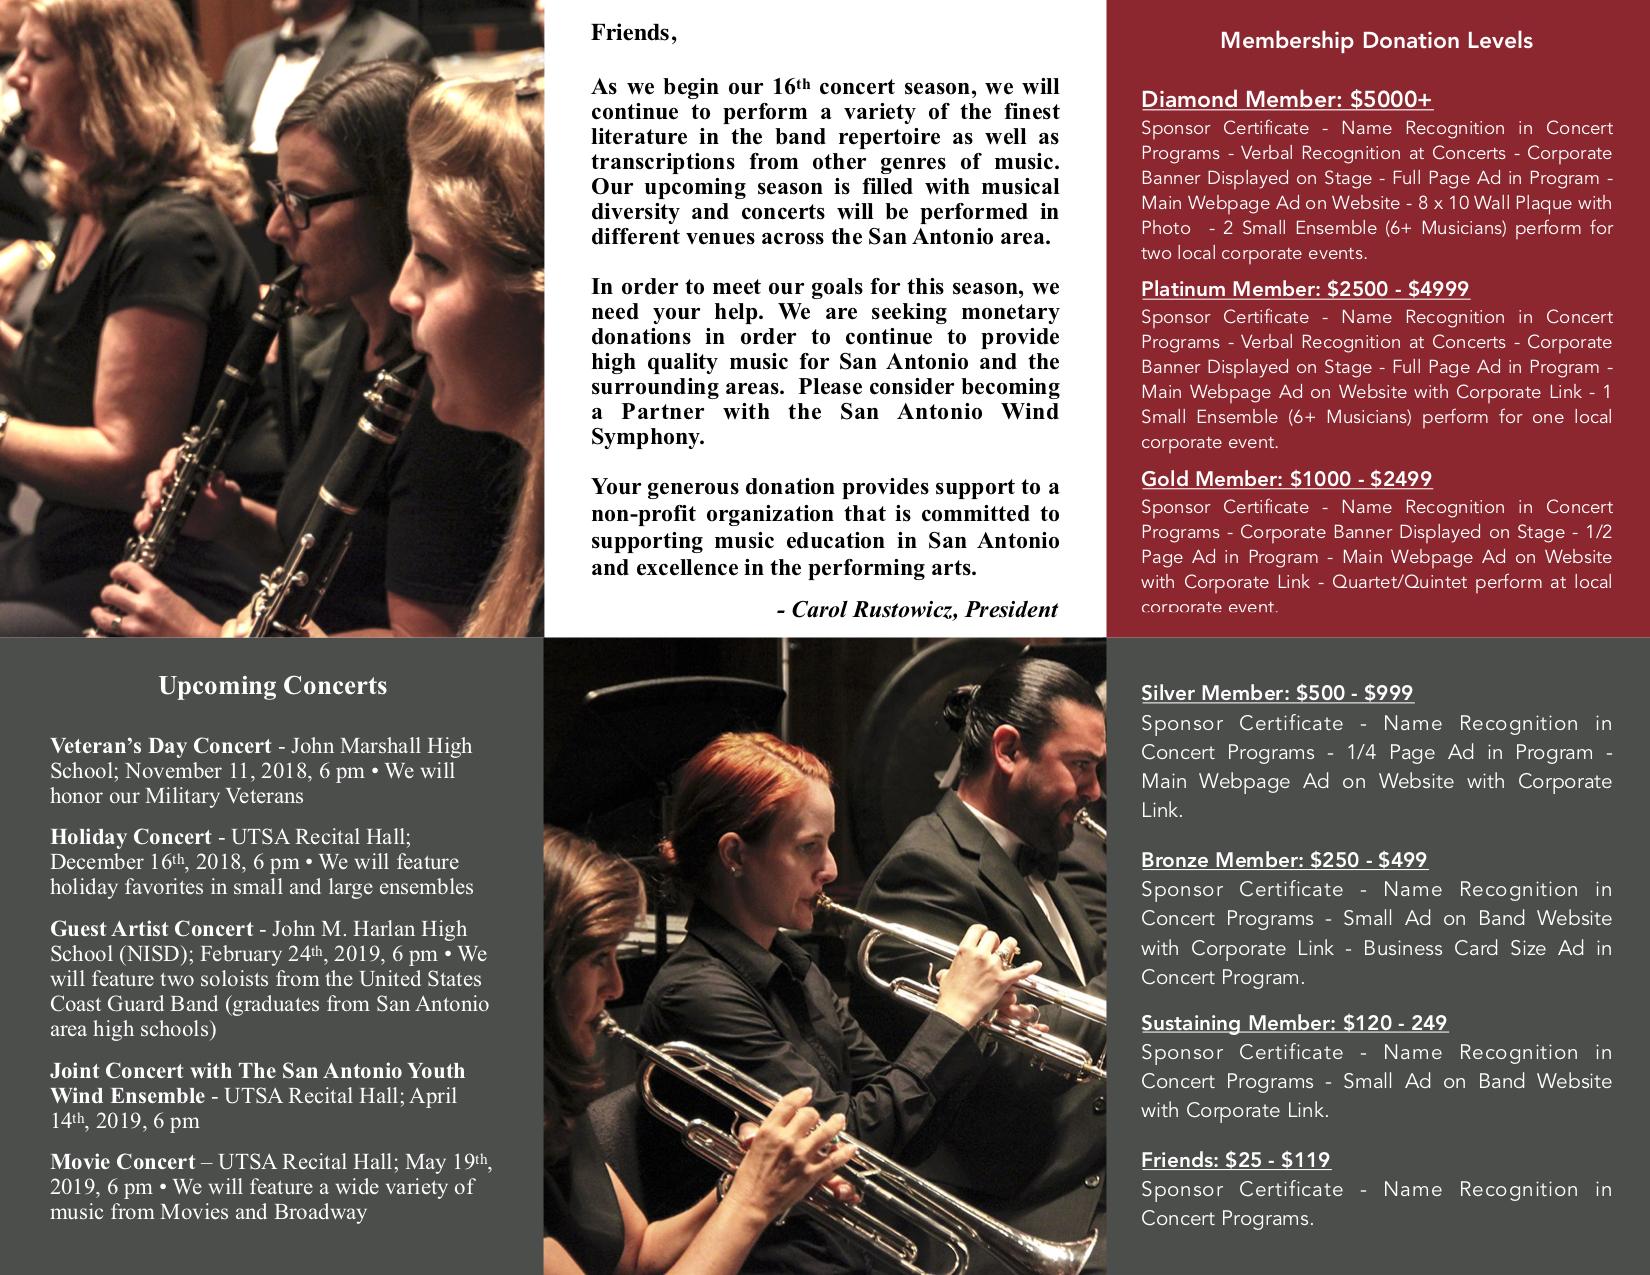 SAWS Brochure Final Version b.jpg